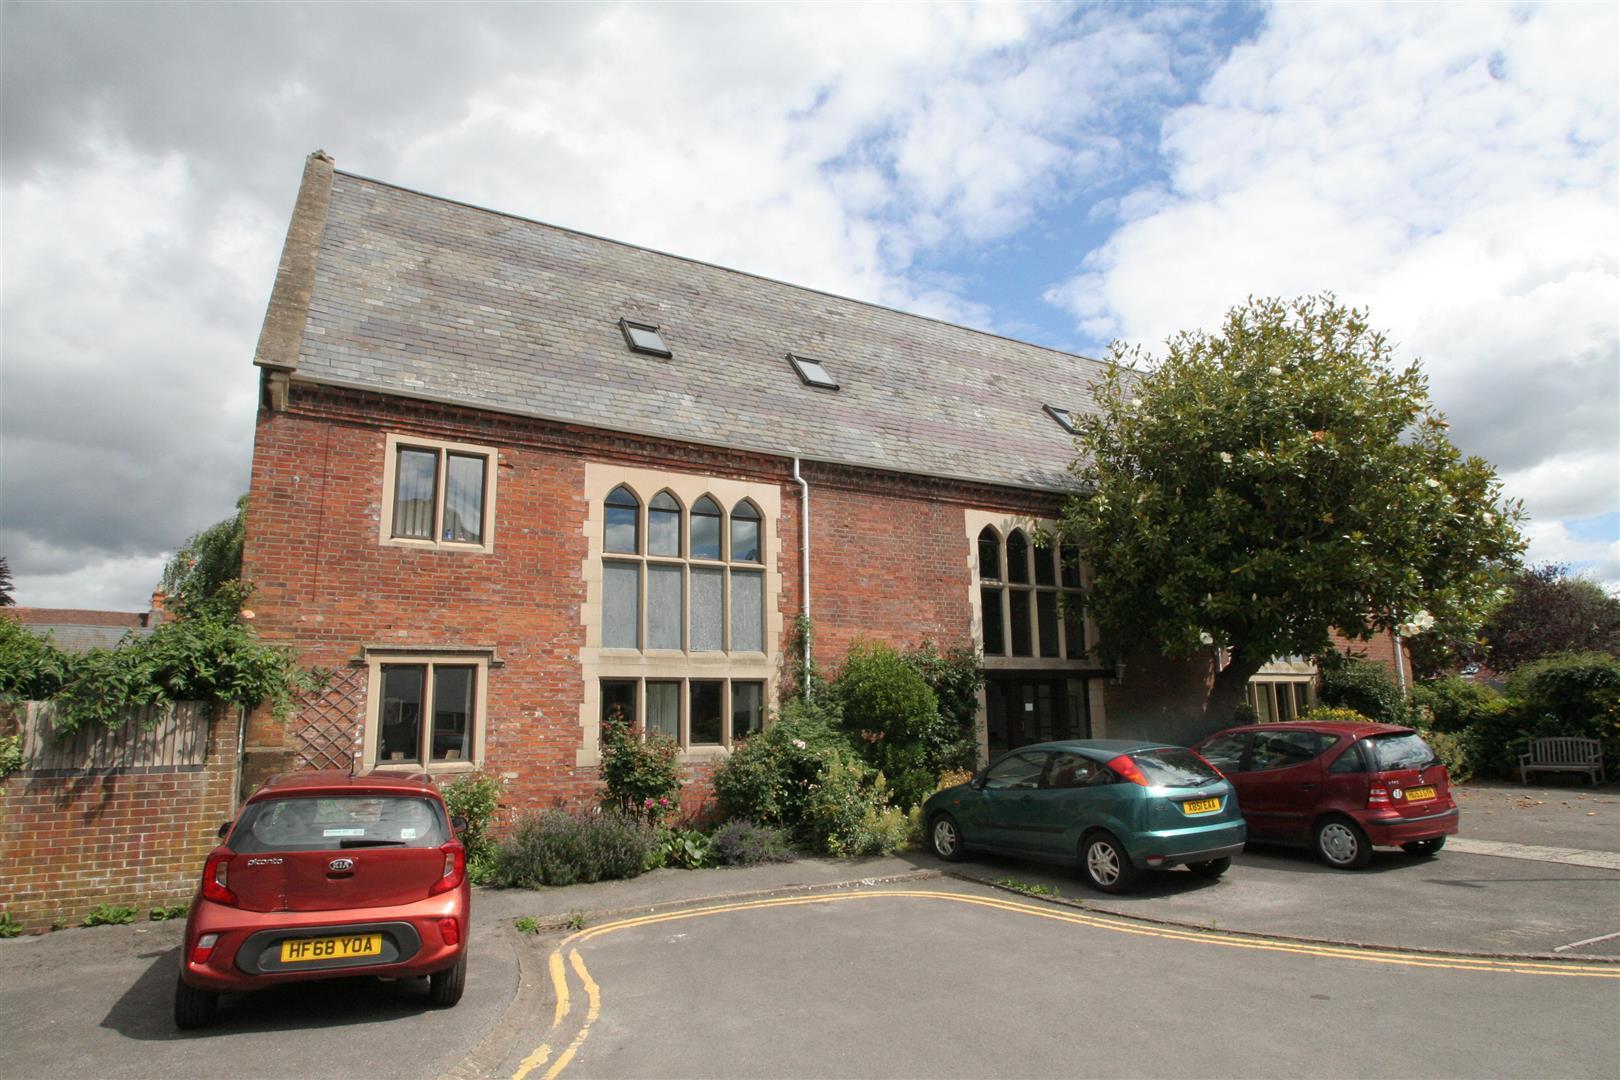 Blackmore Museum, St Ann Place, Salisbury